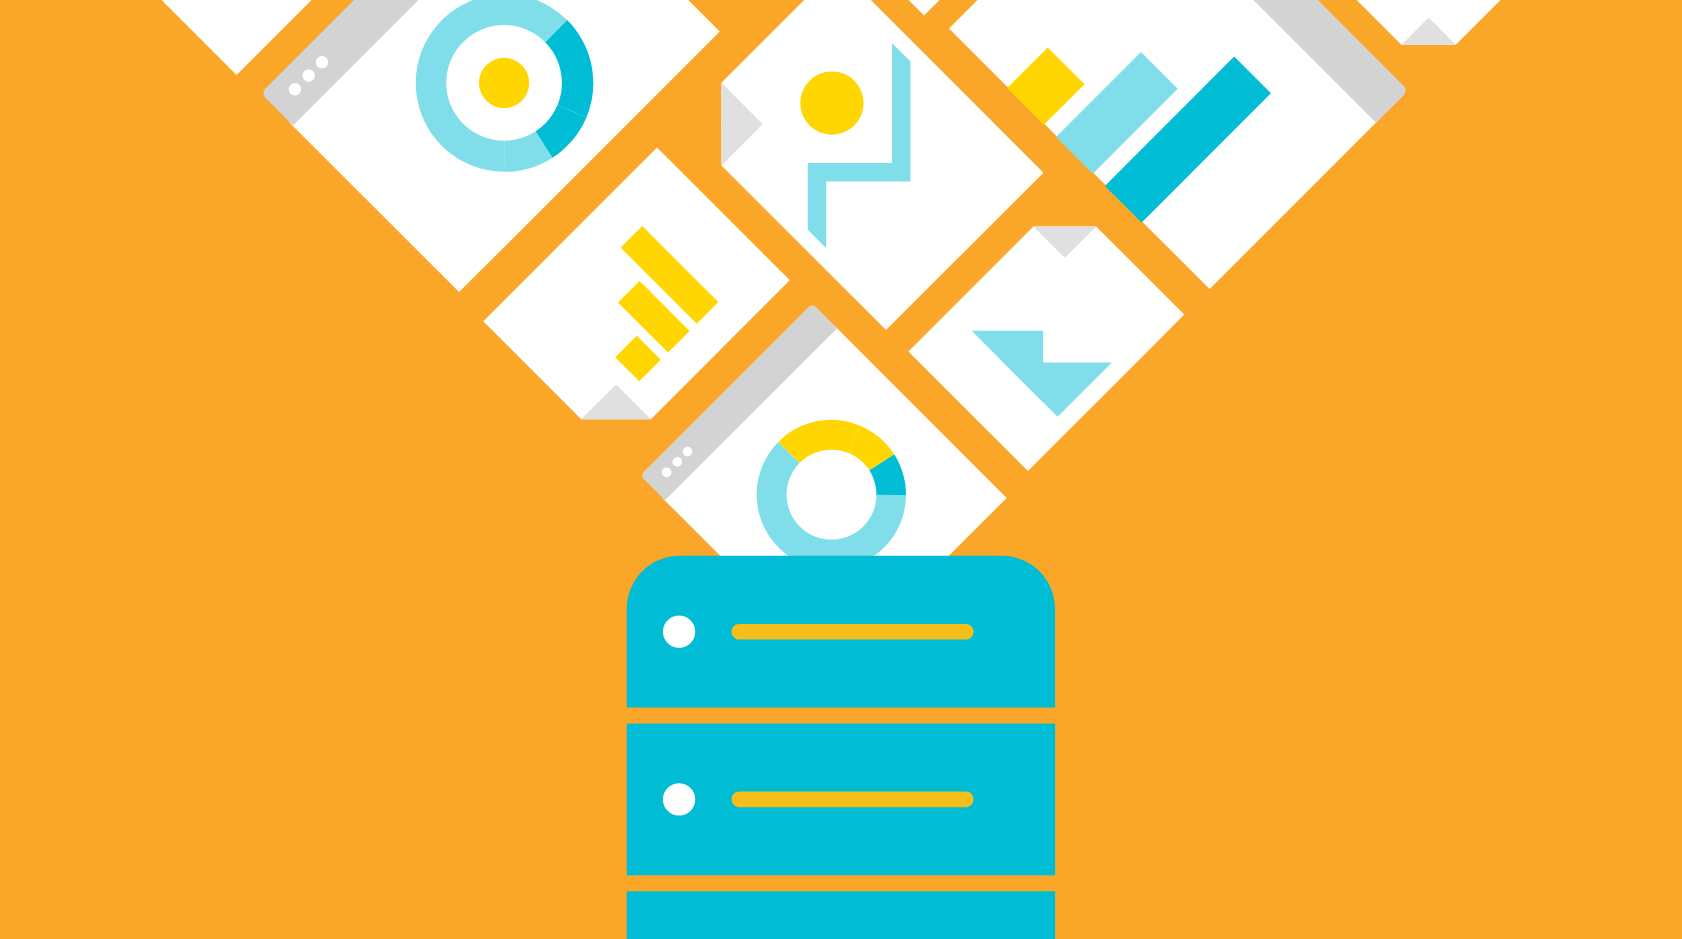 Measurement Protocol 101: Improve Your Google Analytics Data